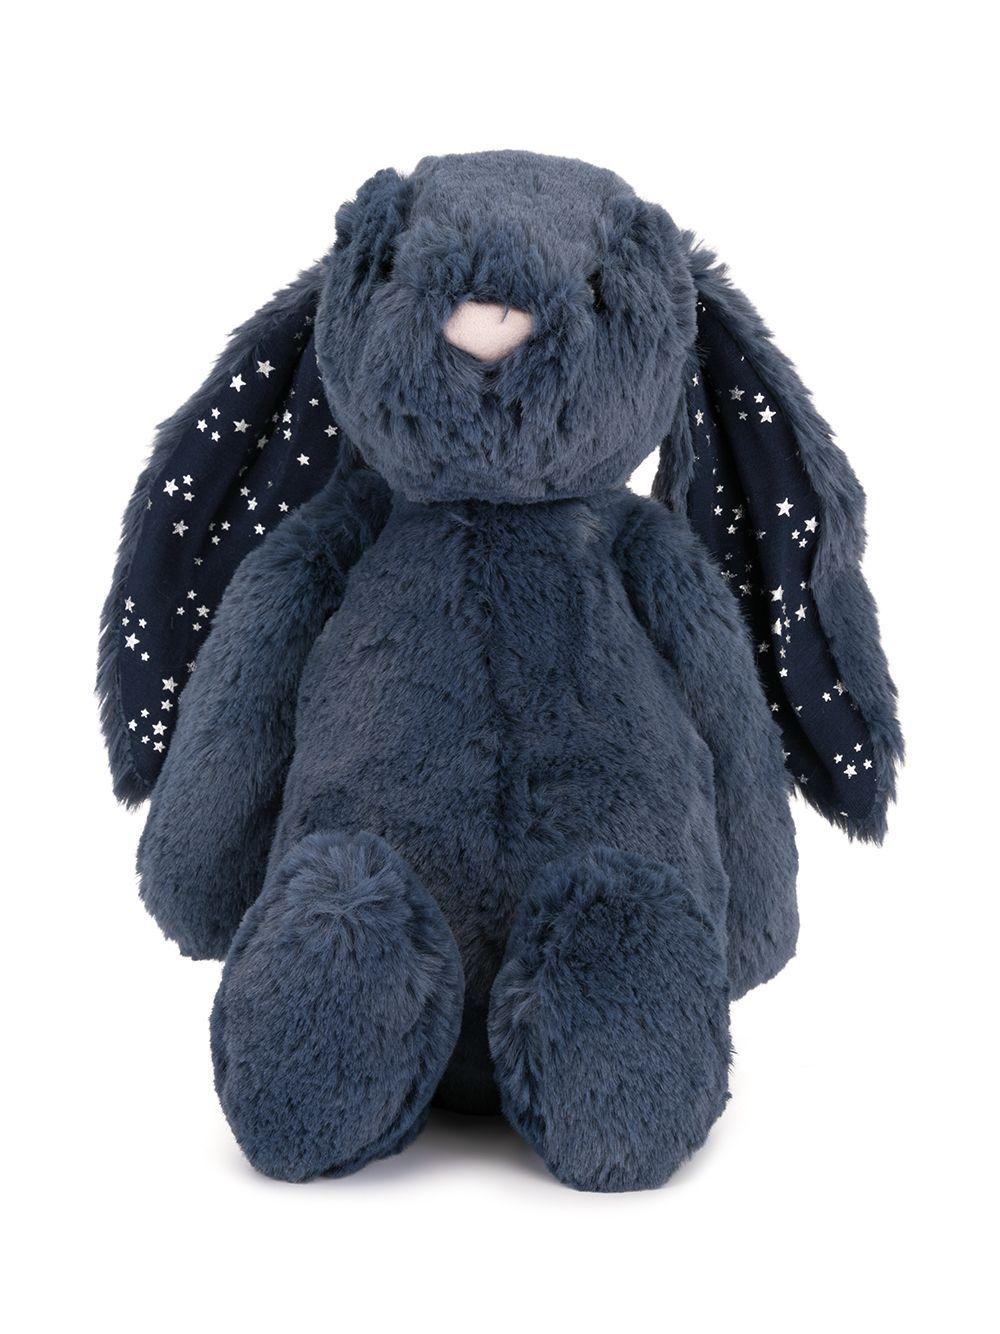 Jellycat Bashful Stardust Bunny Plush #bunnyplush Jellycat Bashful Stardust bunny plush - Blue #bunnyplush